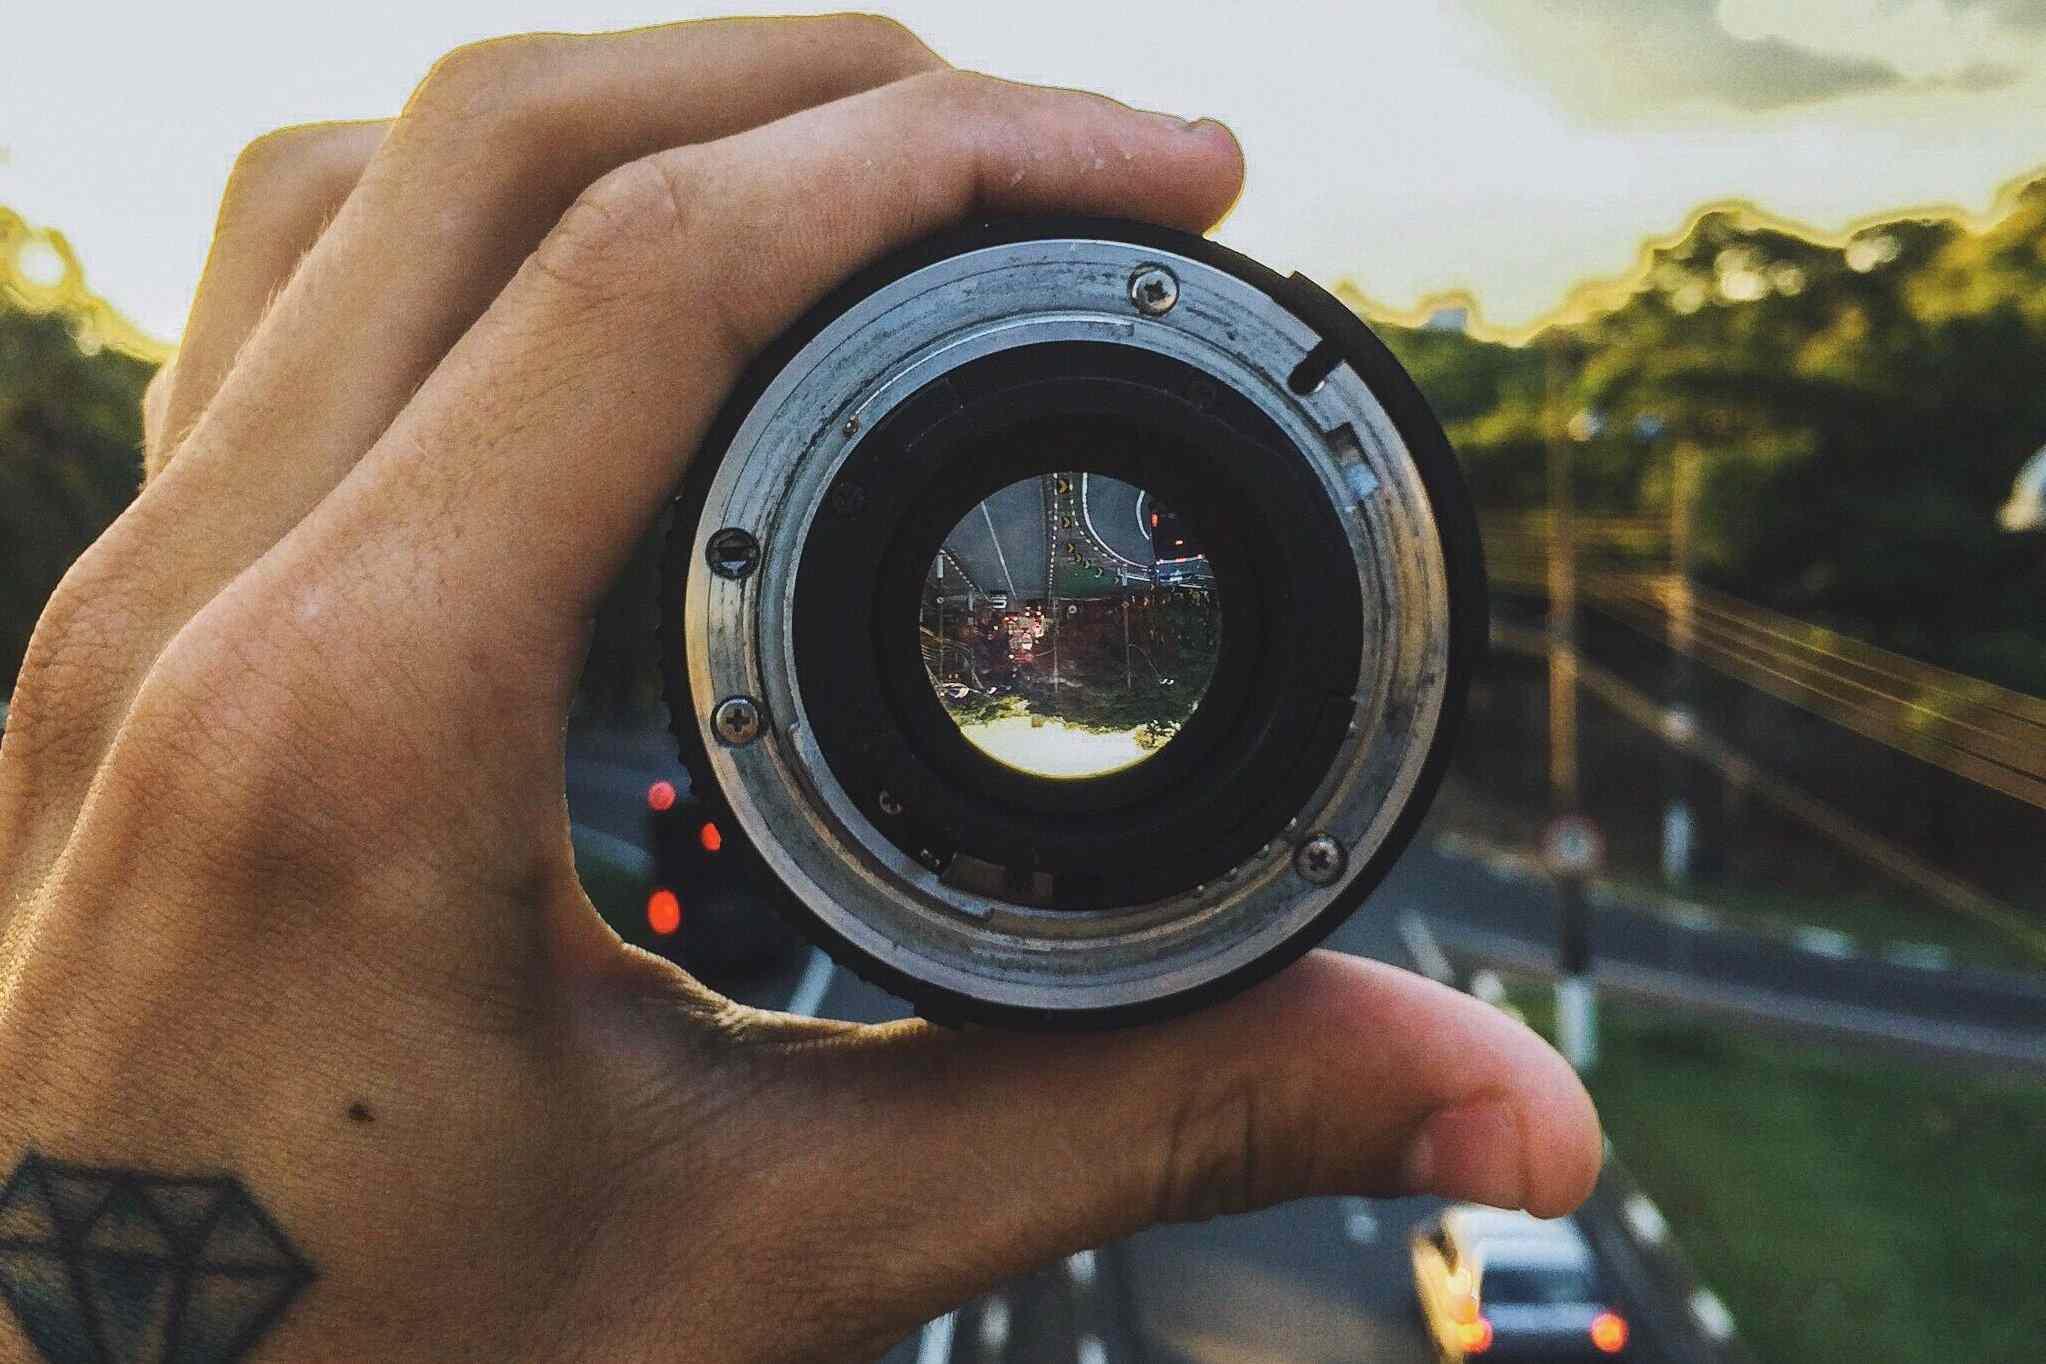 Hand holding camera lens/